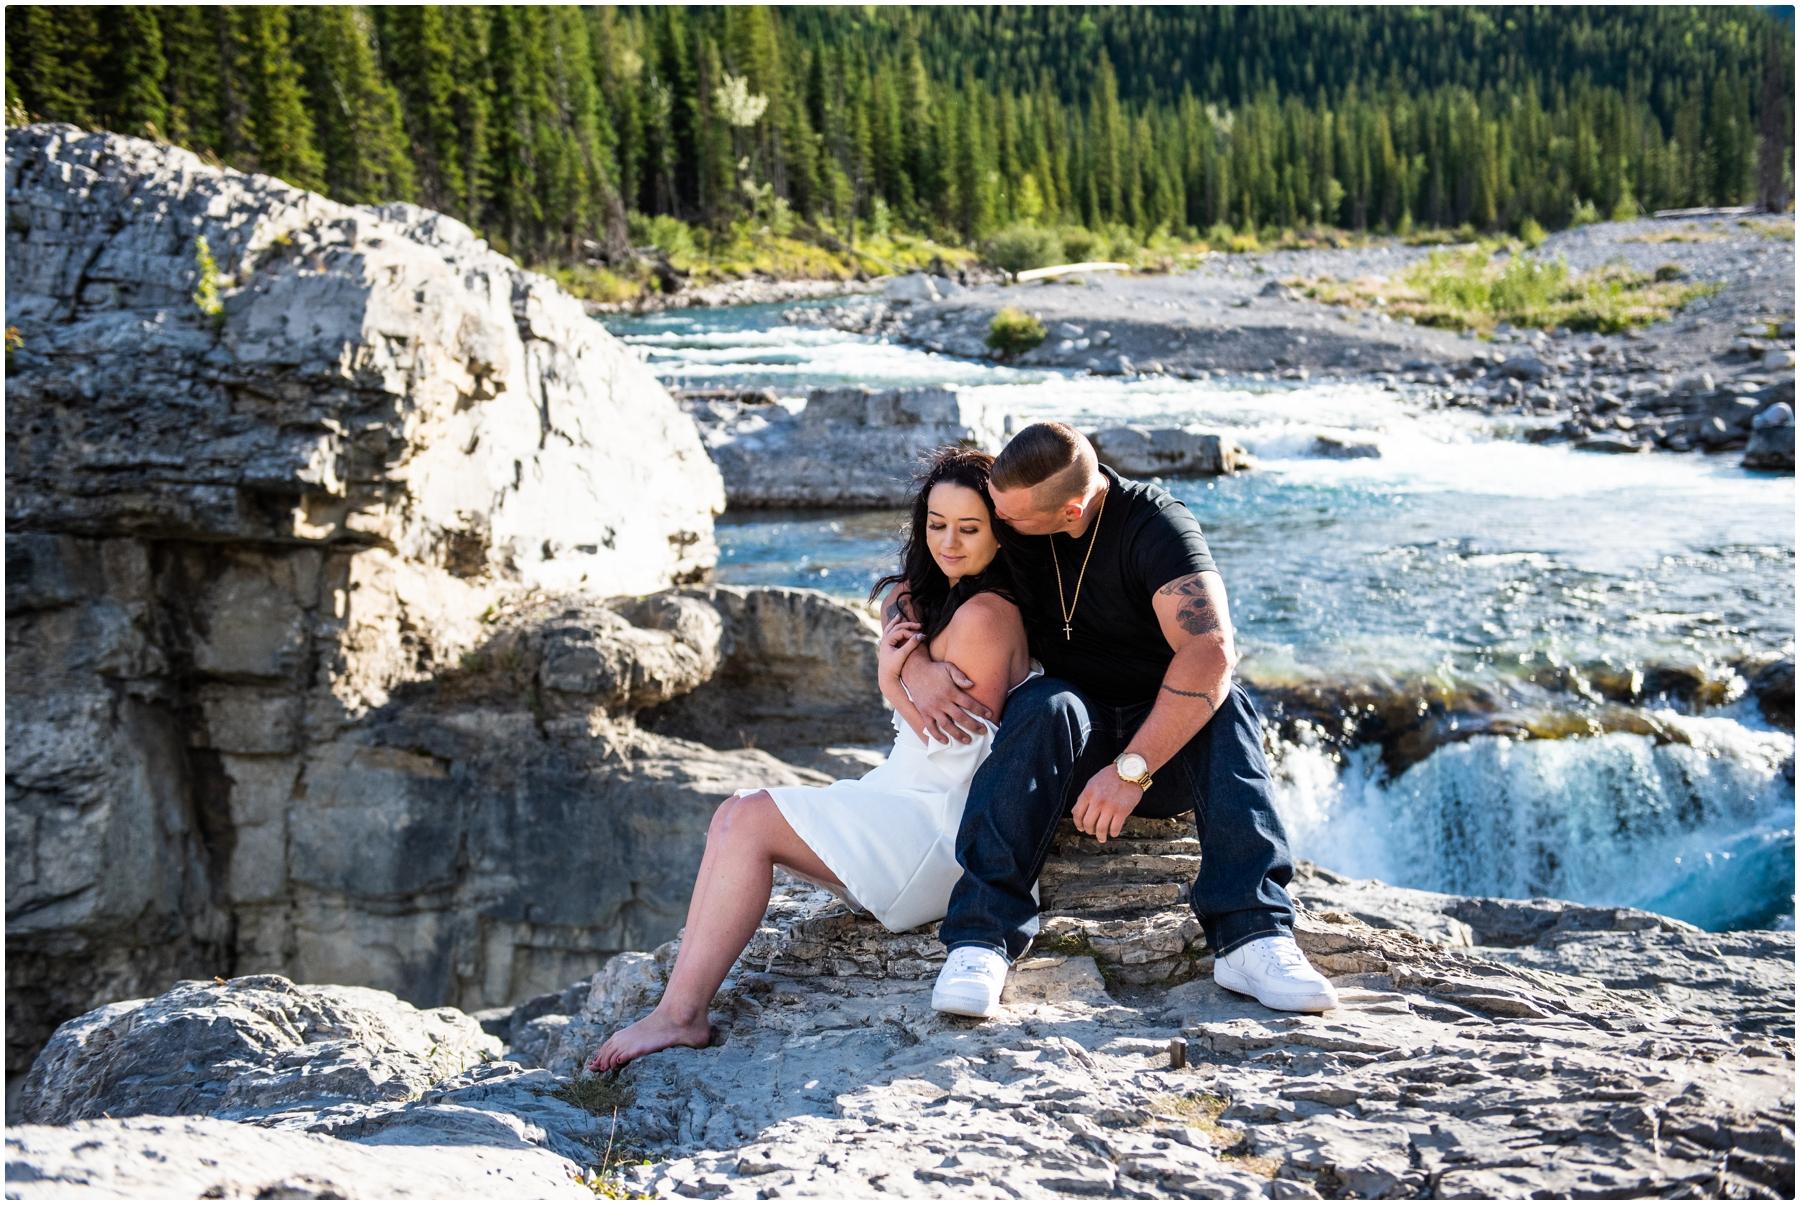 Engagement Photos - Calgary Wedding Photographer